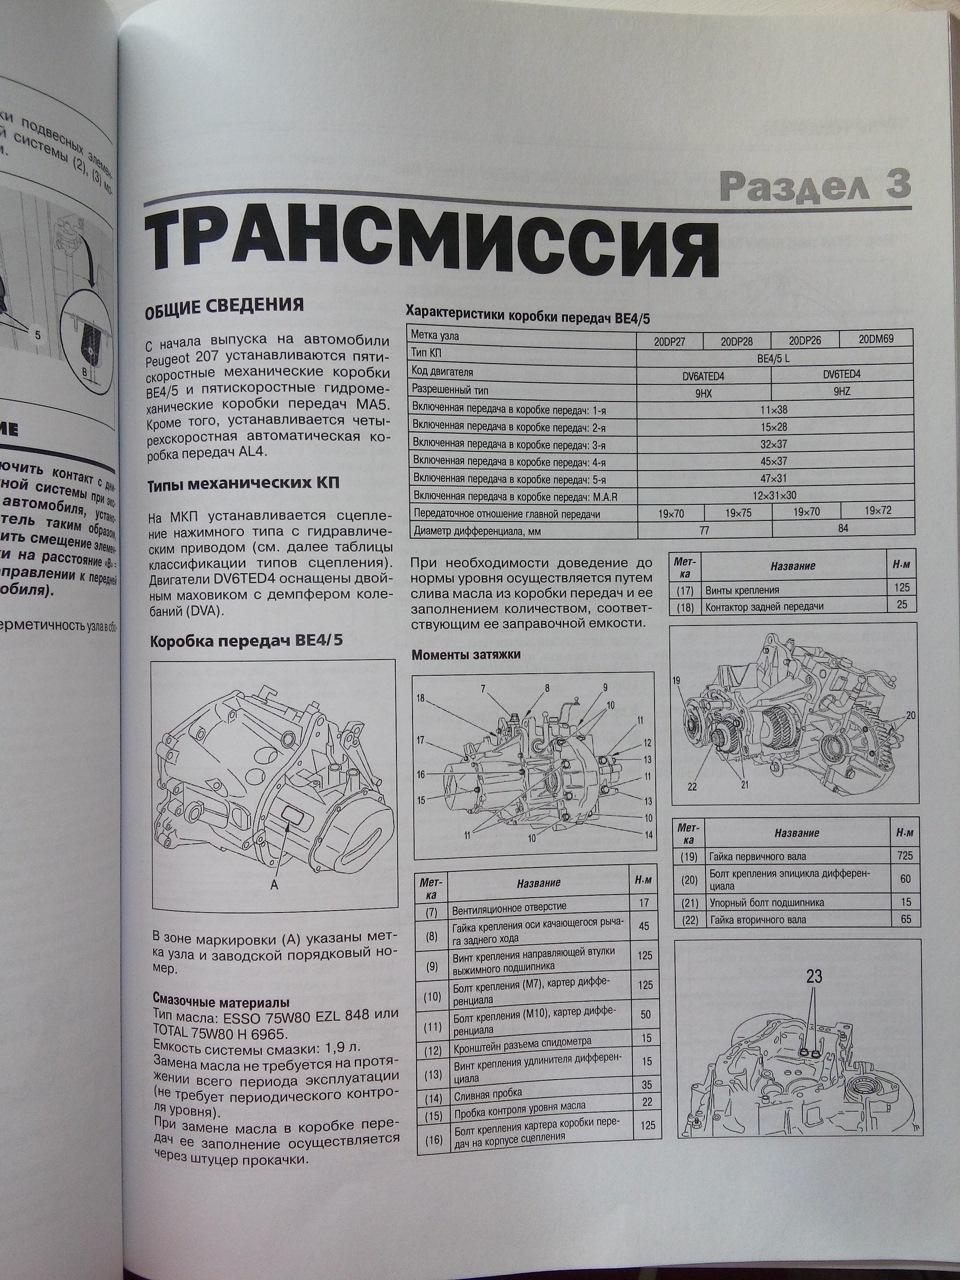 Руководство по ремонту peugeot 207 pdf